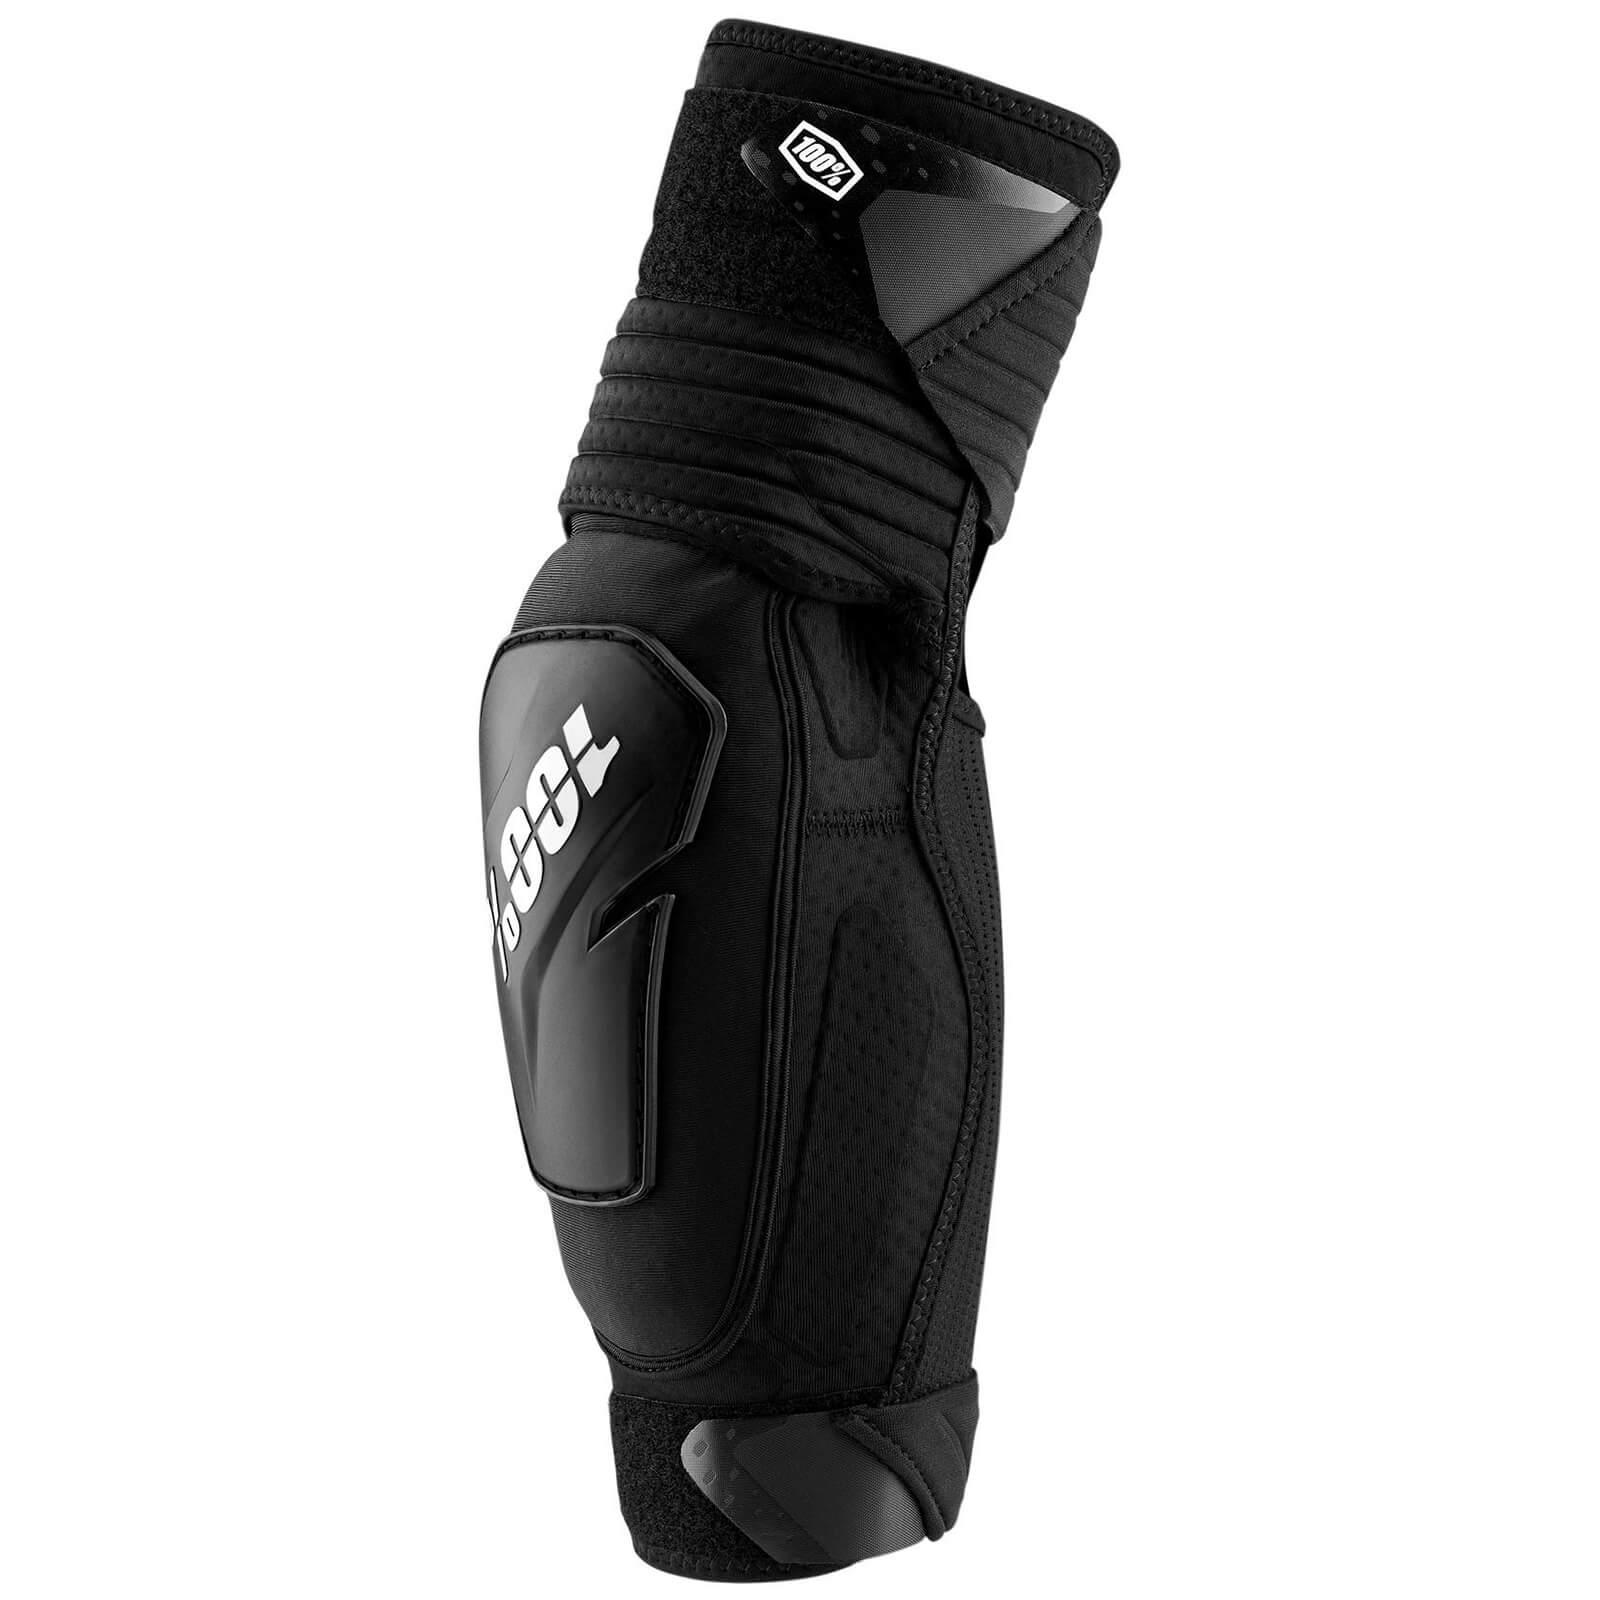 100% Fortis MTB Elbow & Arm Guards - L/XL - Schwarz